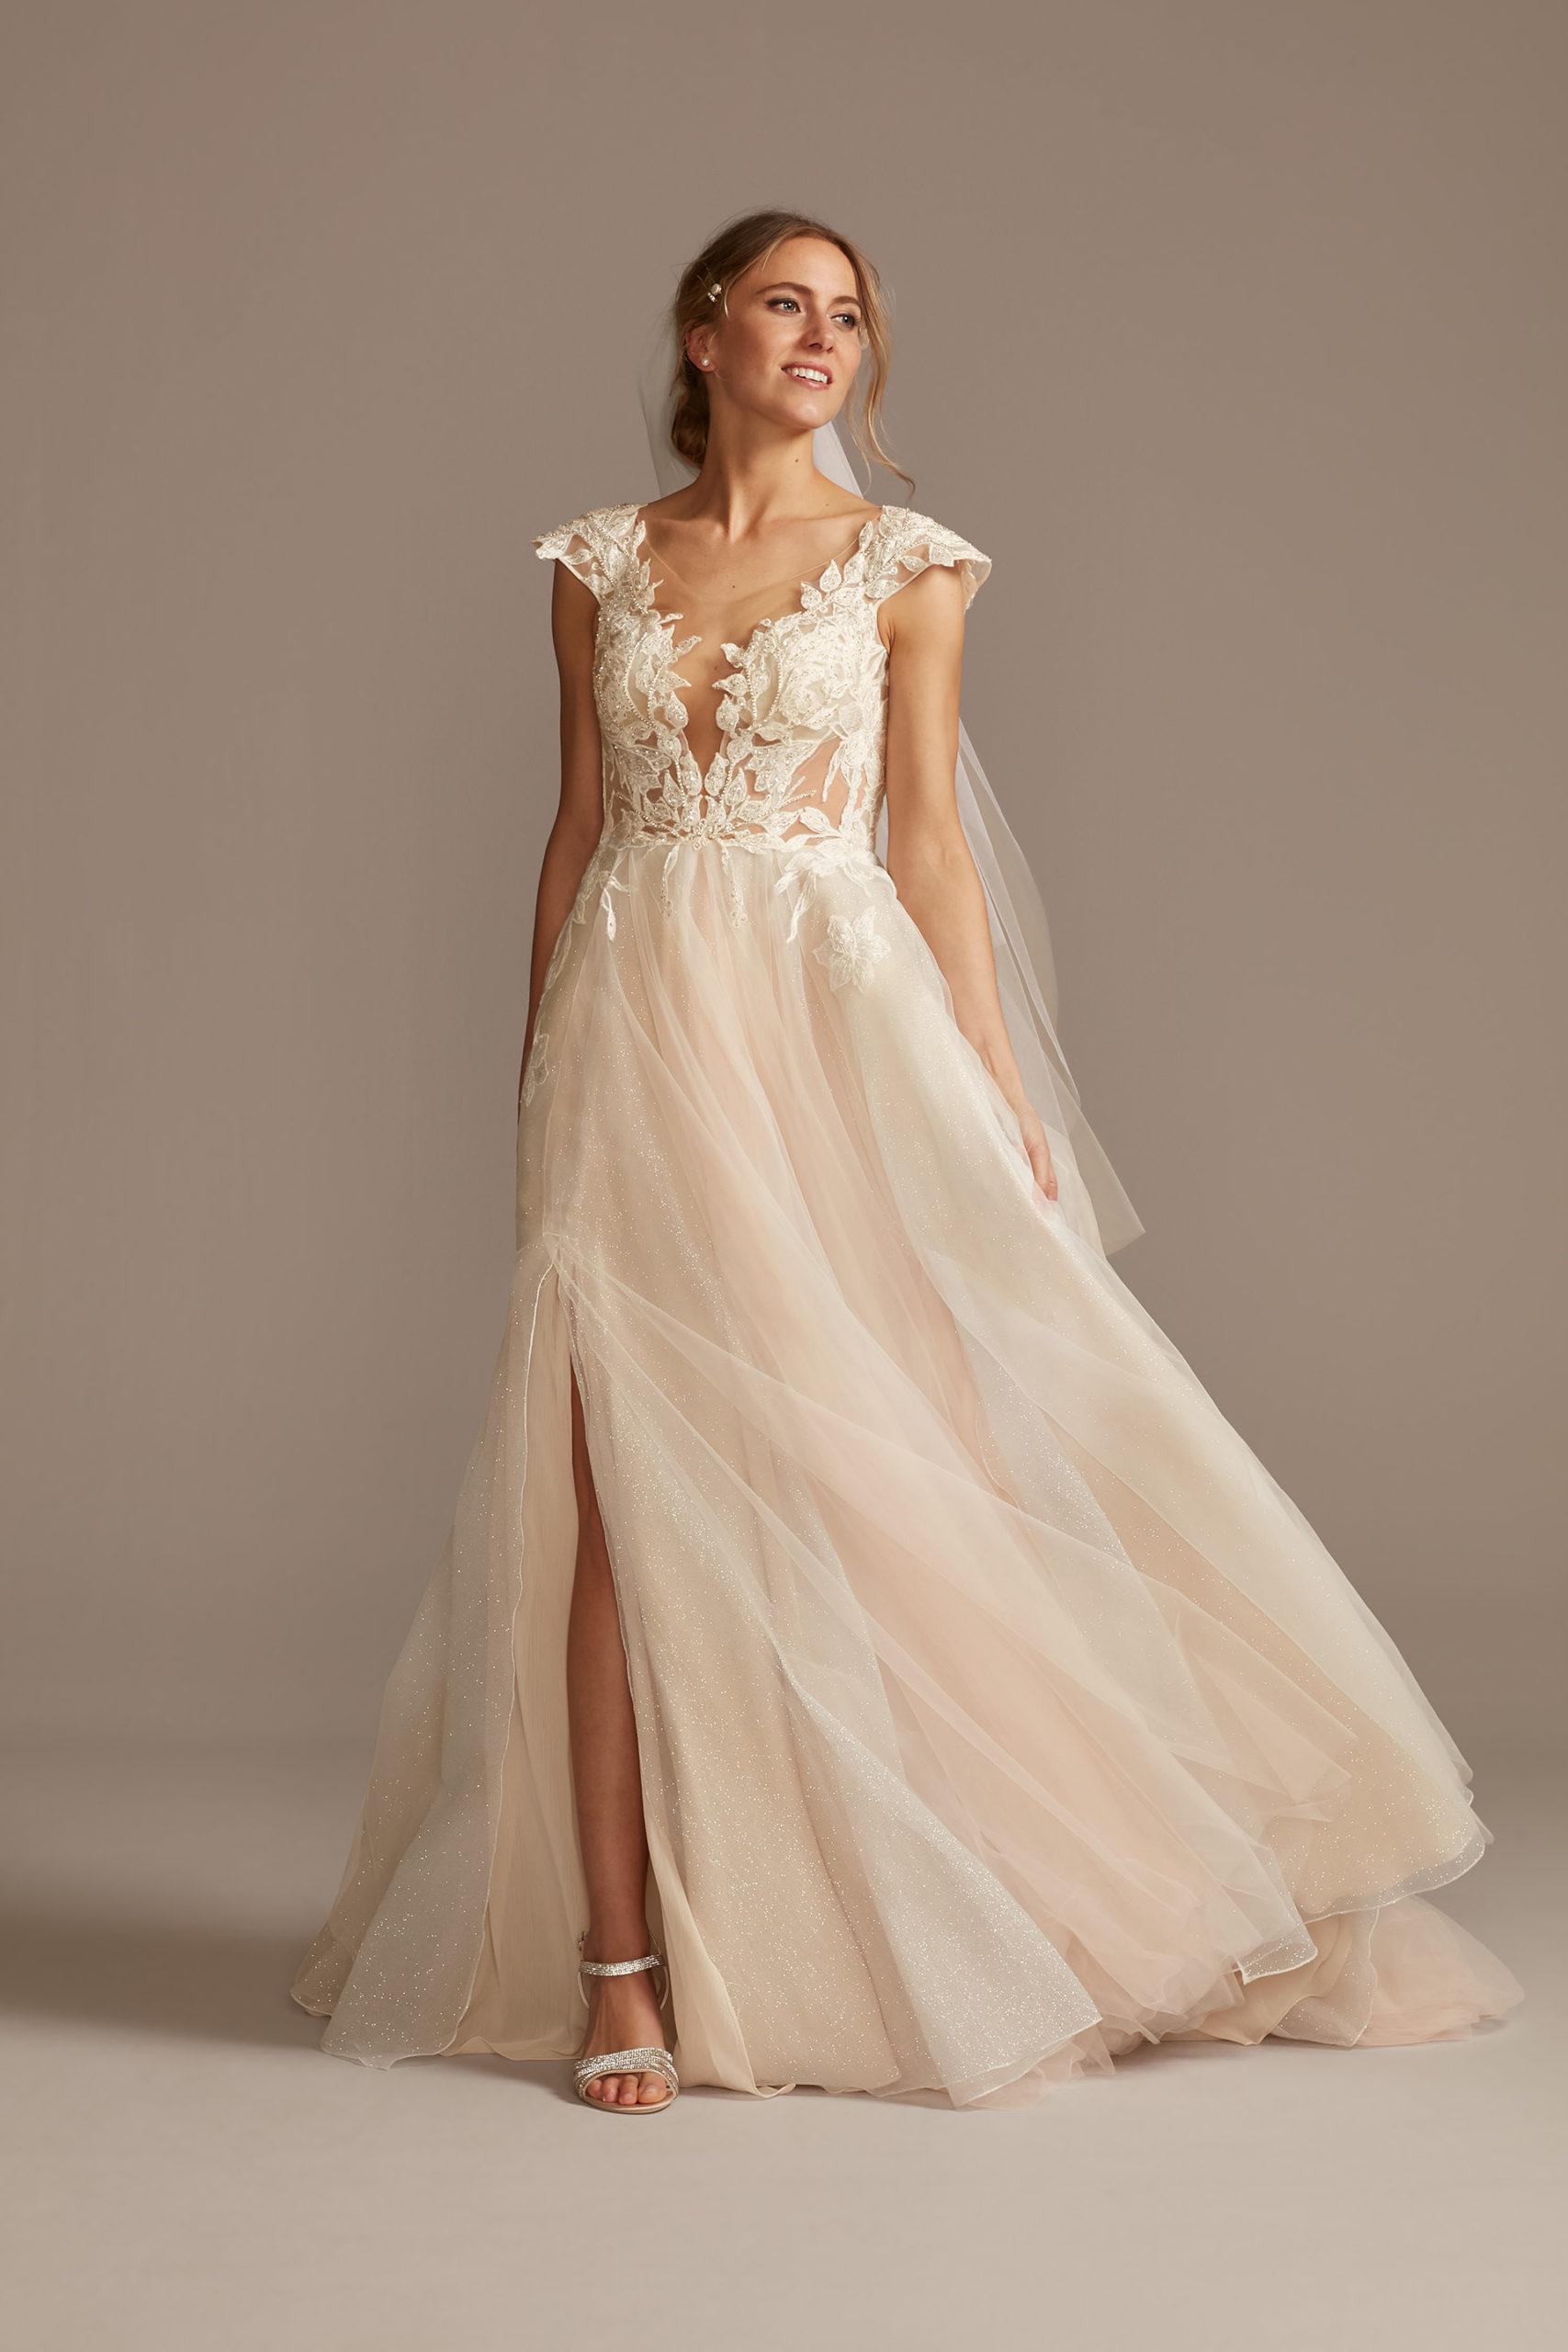 Bride wearing illusion cap sleeve lace appliqued wedding dress